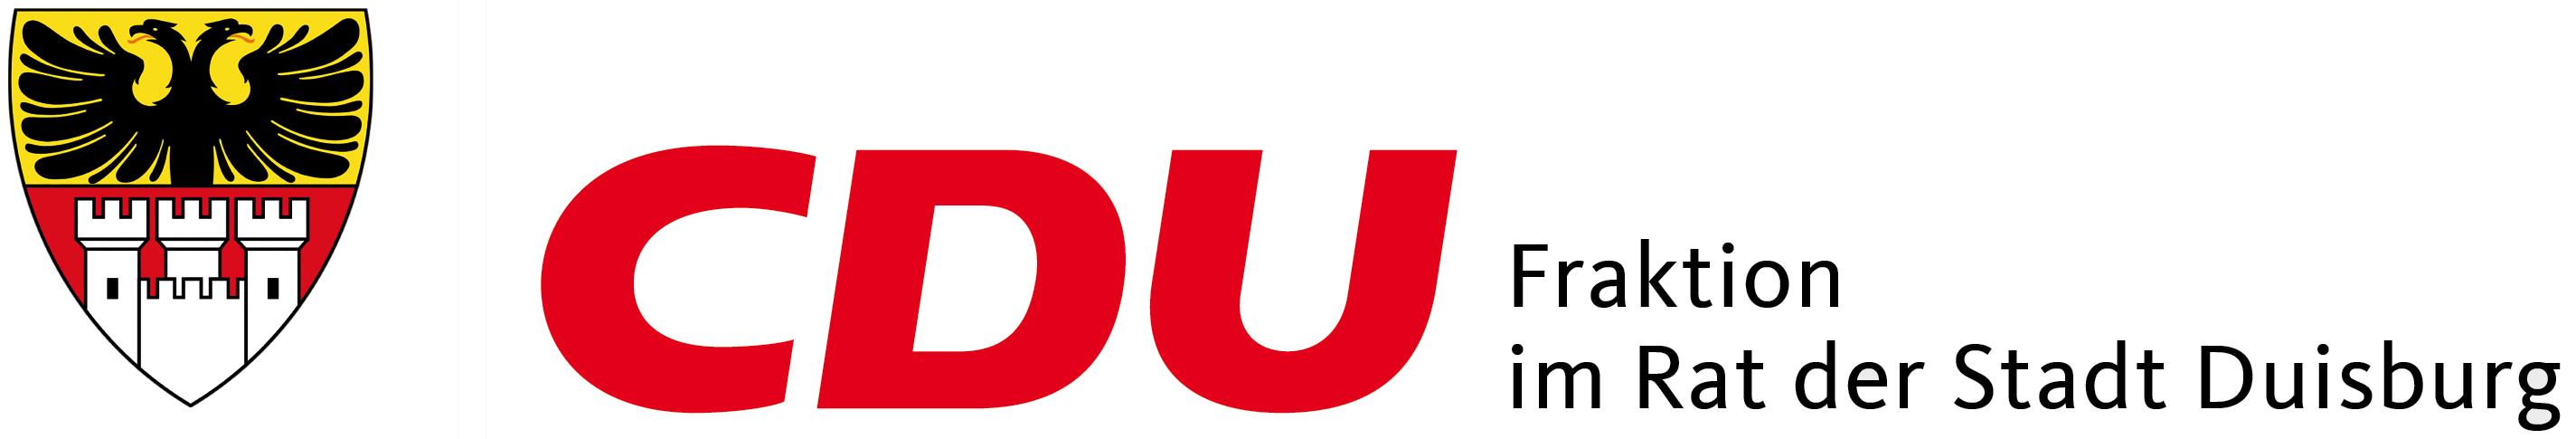 CDU Ratsfraktion Duisburg